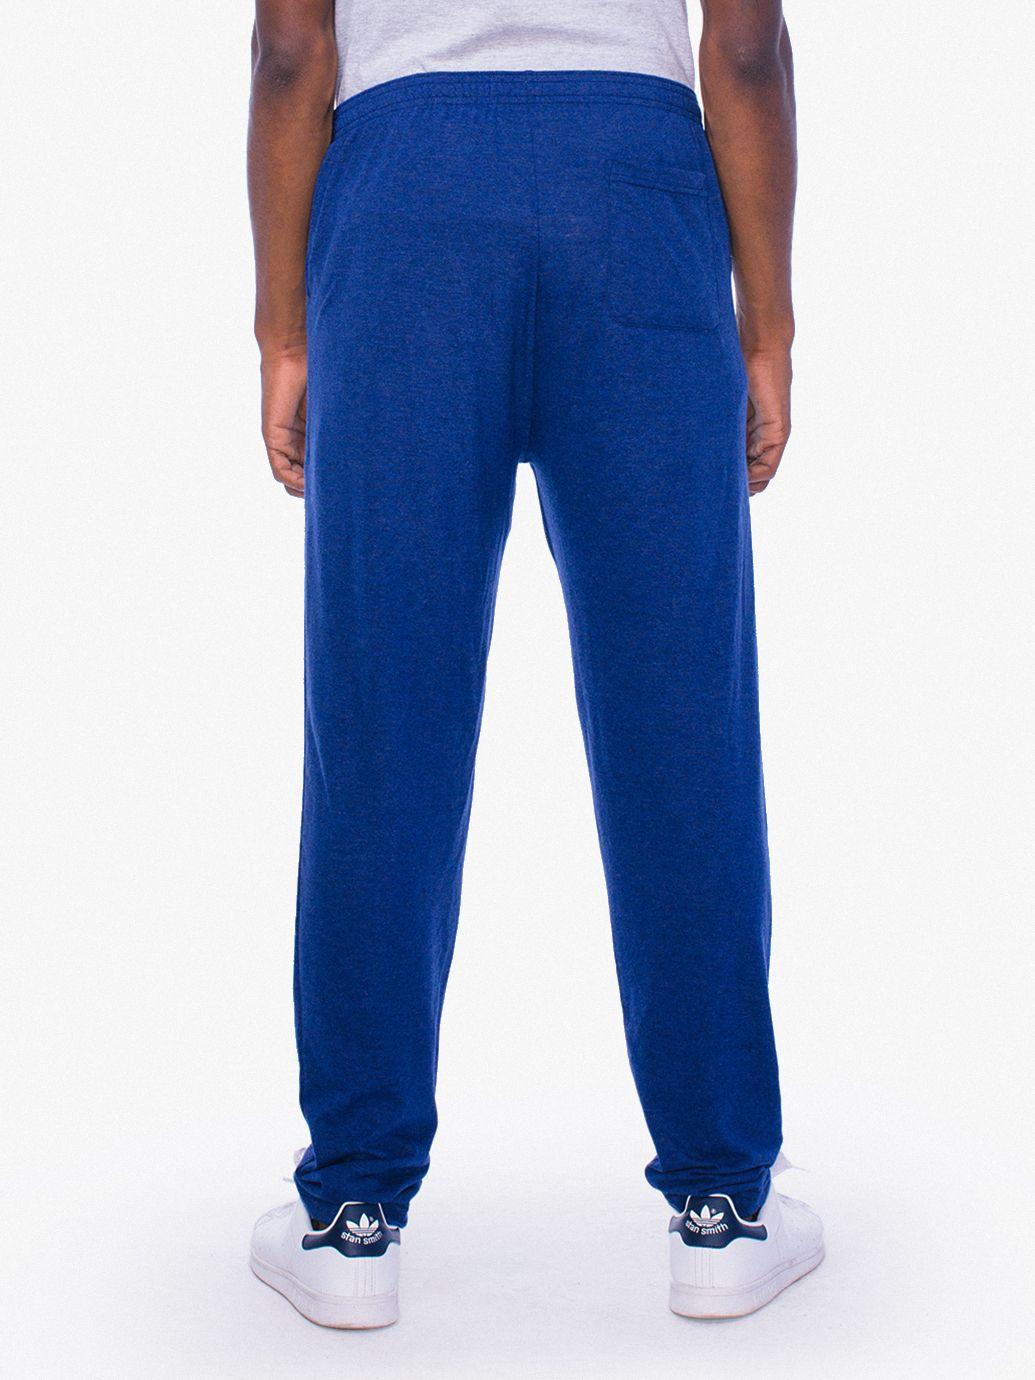 5f3c6a0856 Tri-Blend Lounge Pant | American Apparel